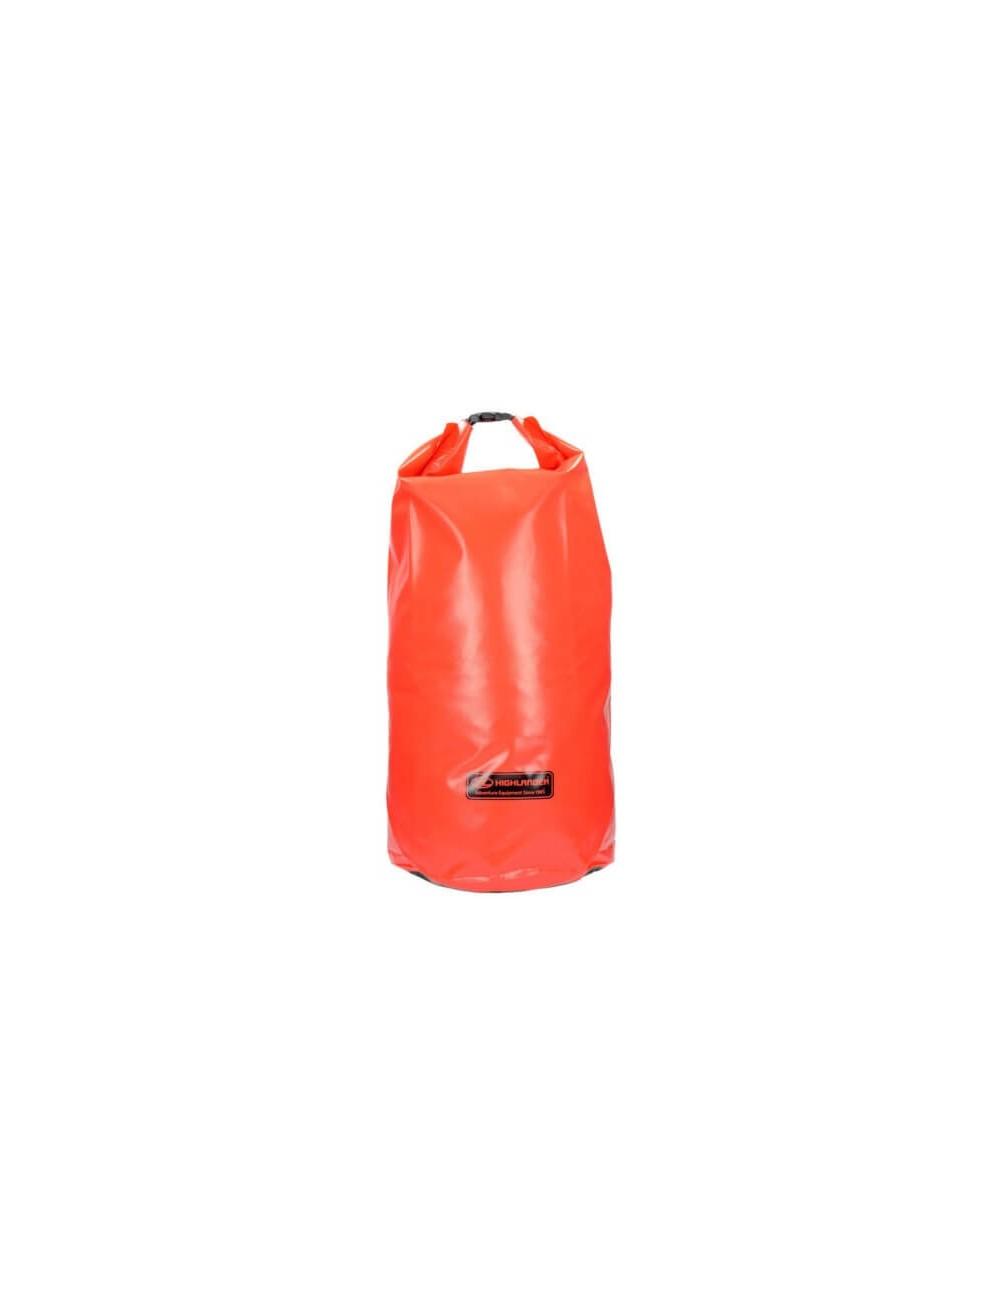 Highlander waterzichte tas Dry bag Tri-Laminate PVC 44 liter - Oranje